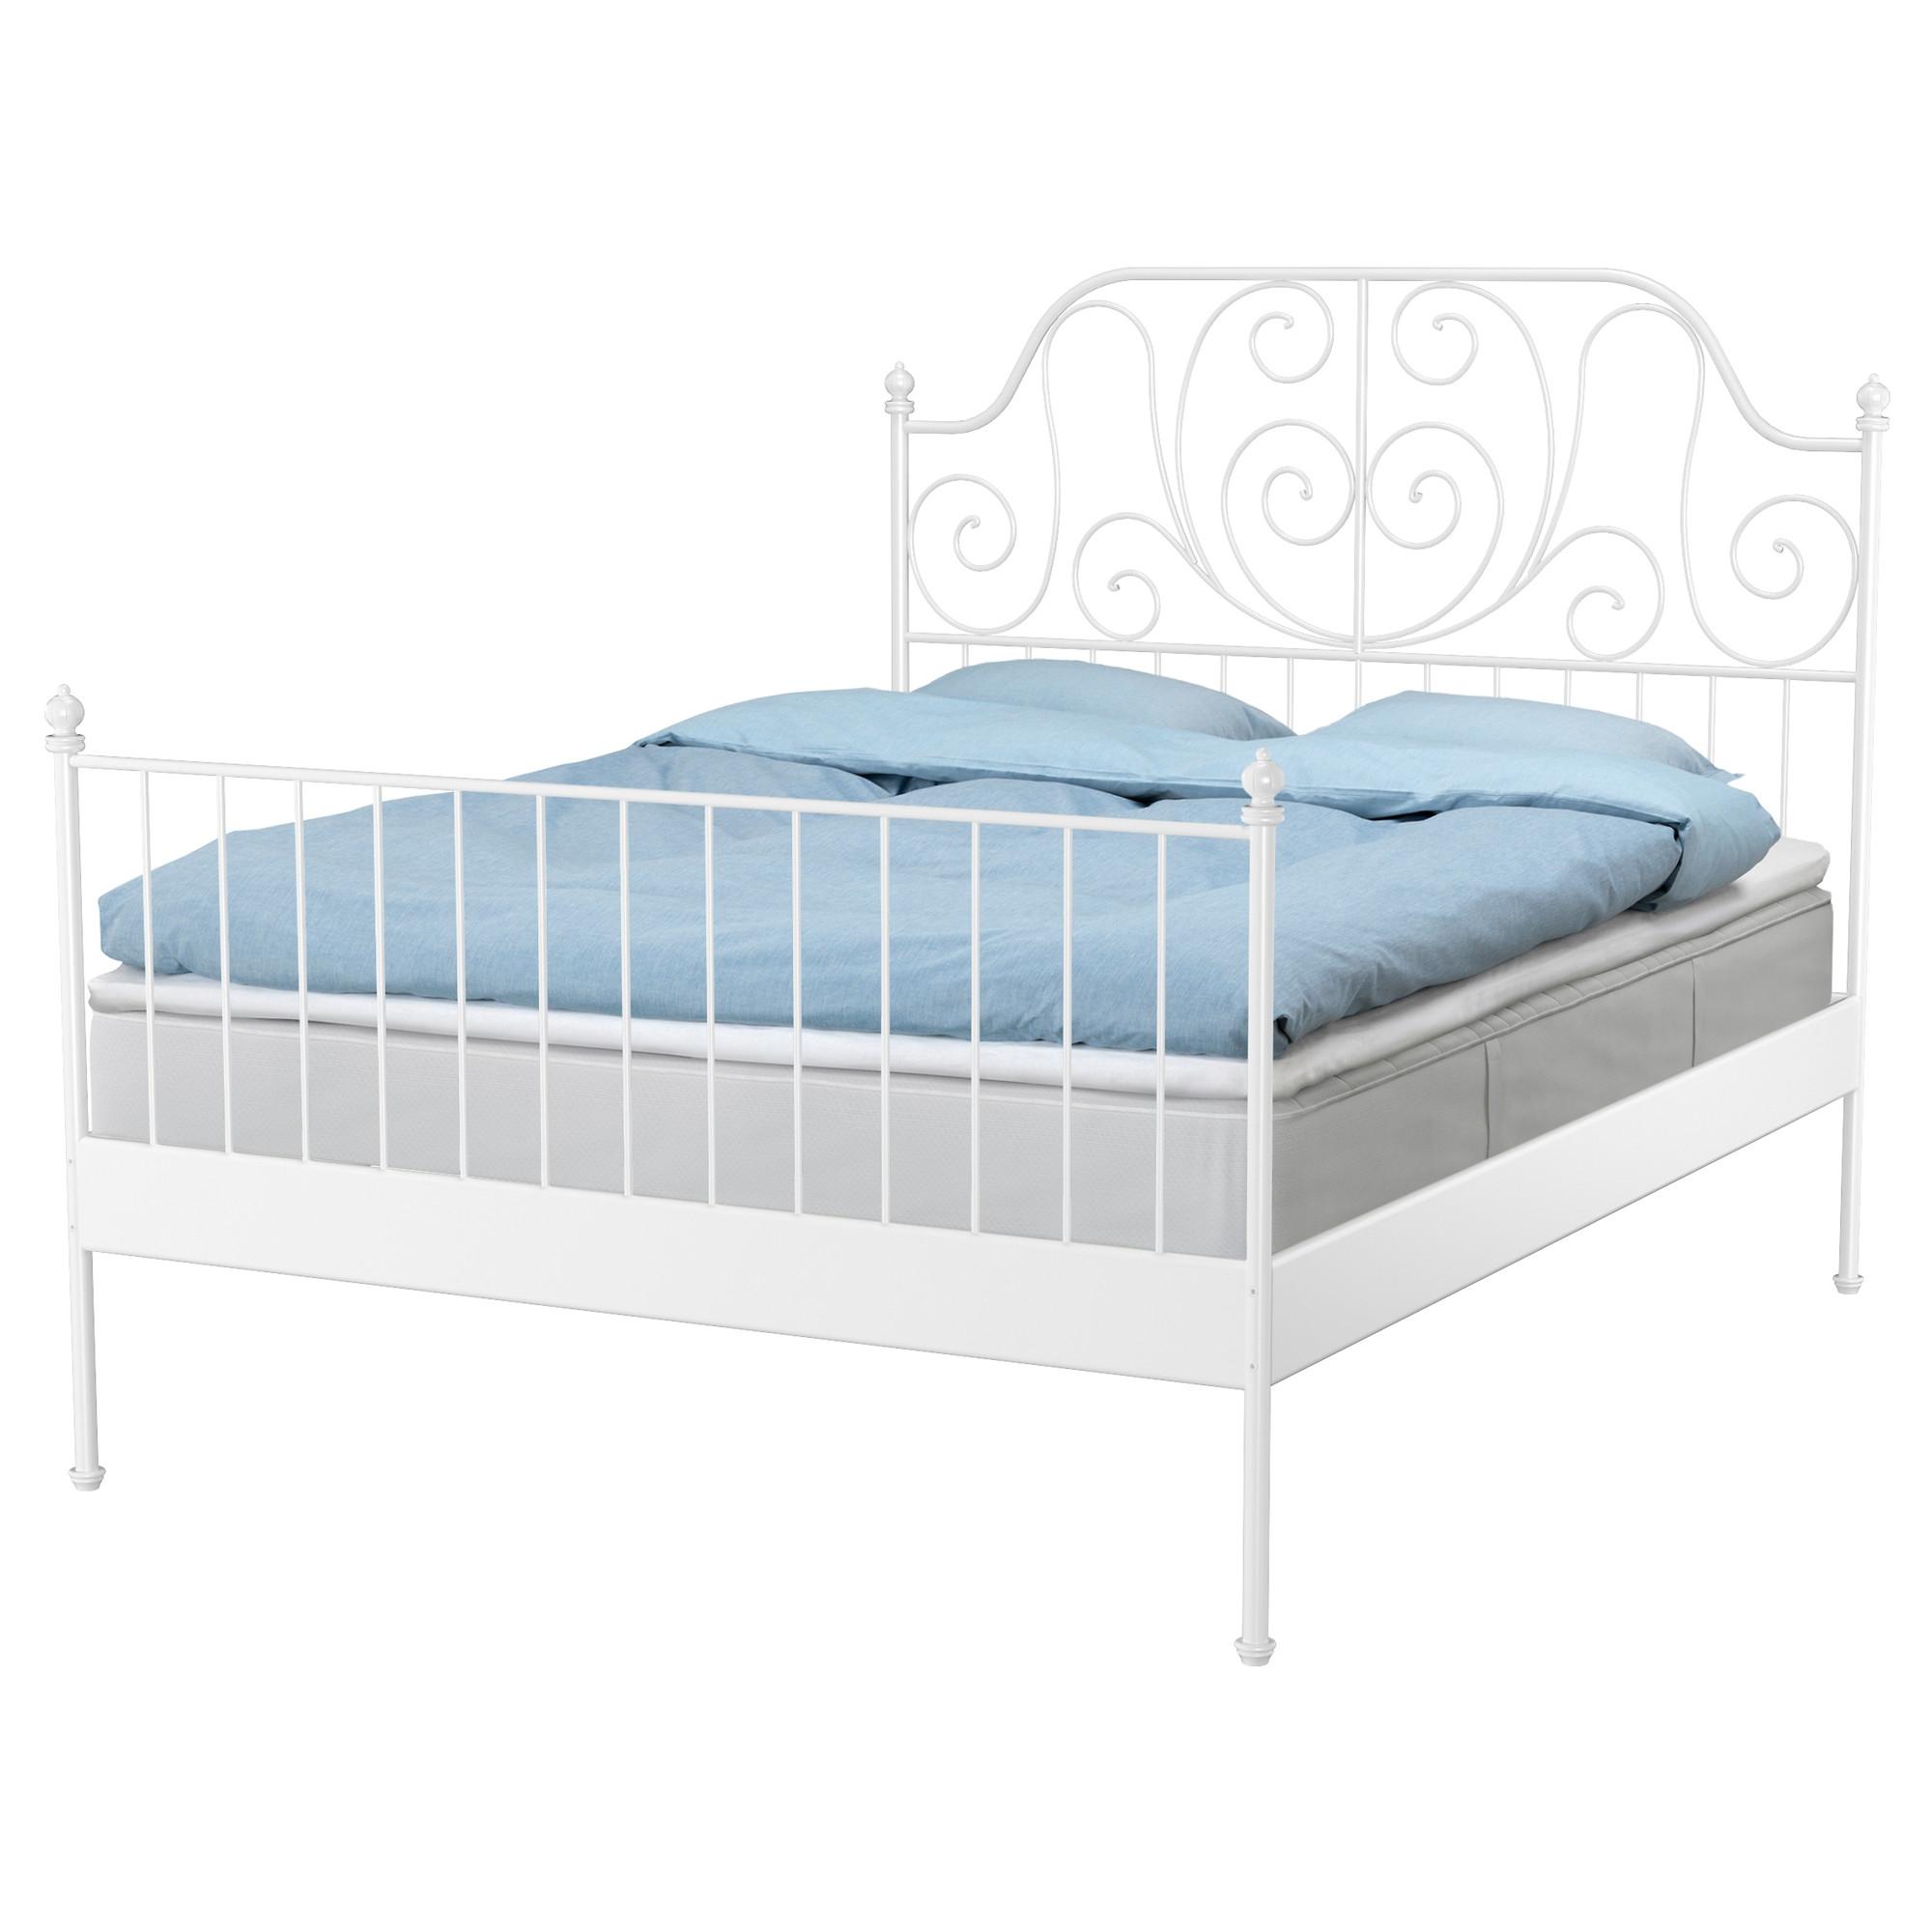 LEIRVIK cabecera/pies de la cama